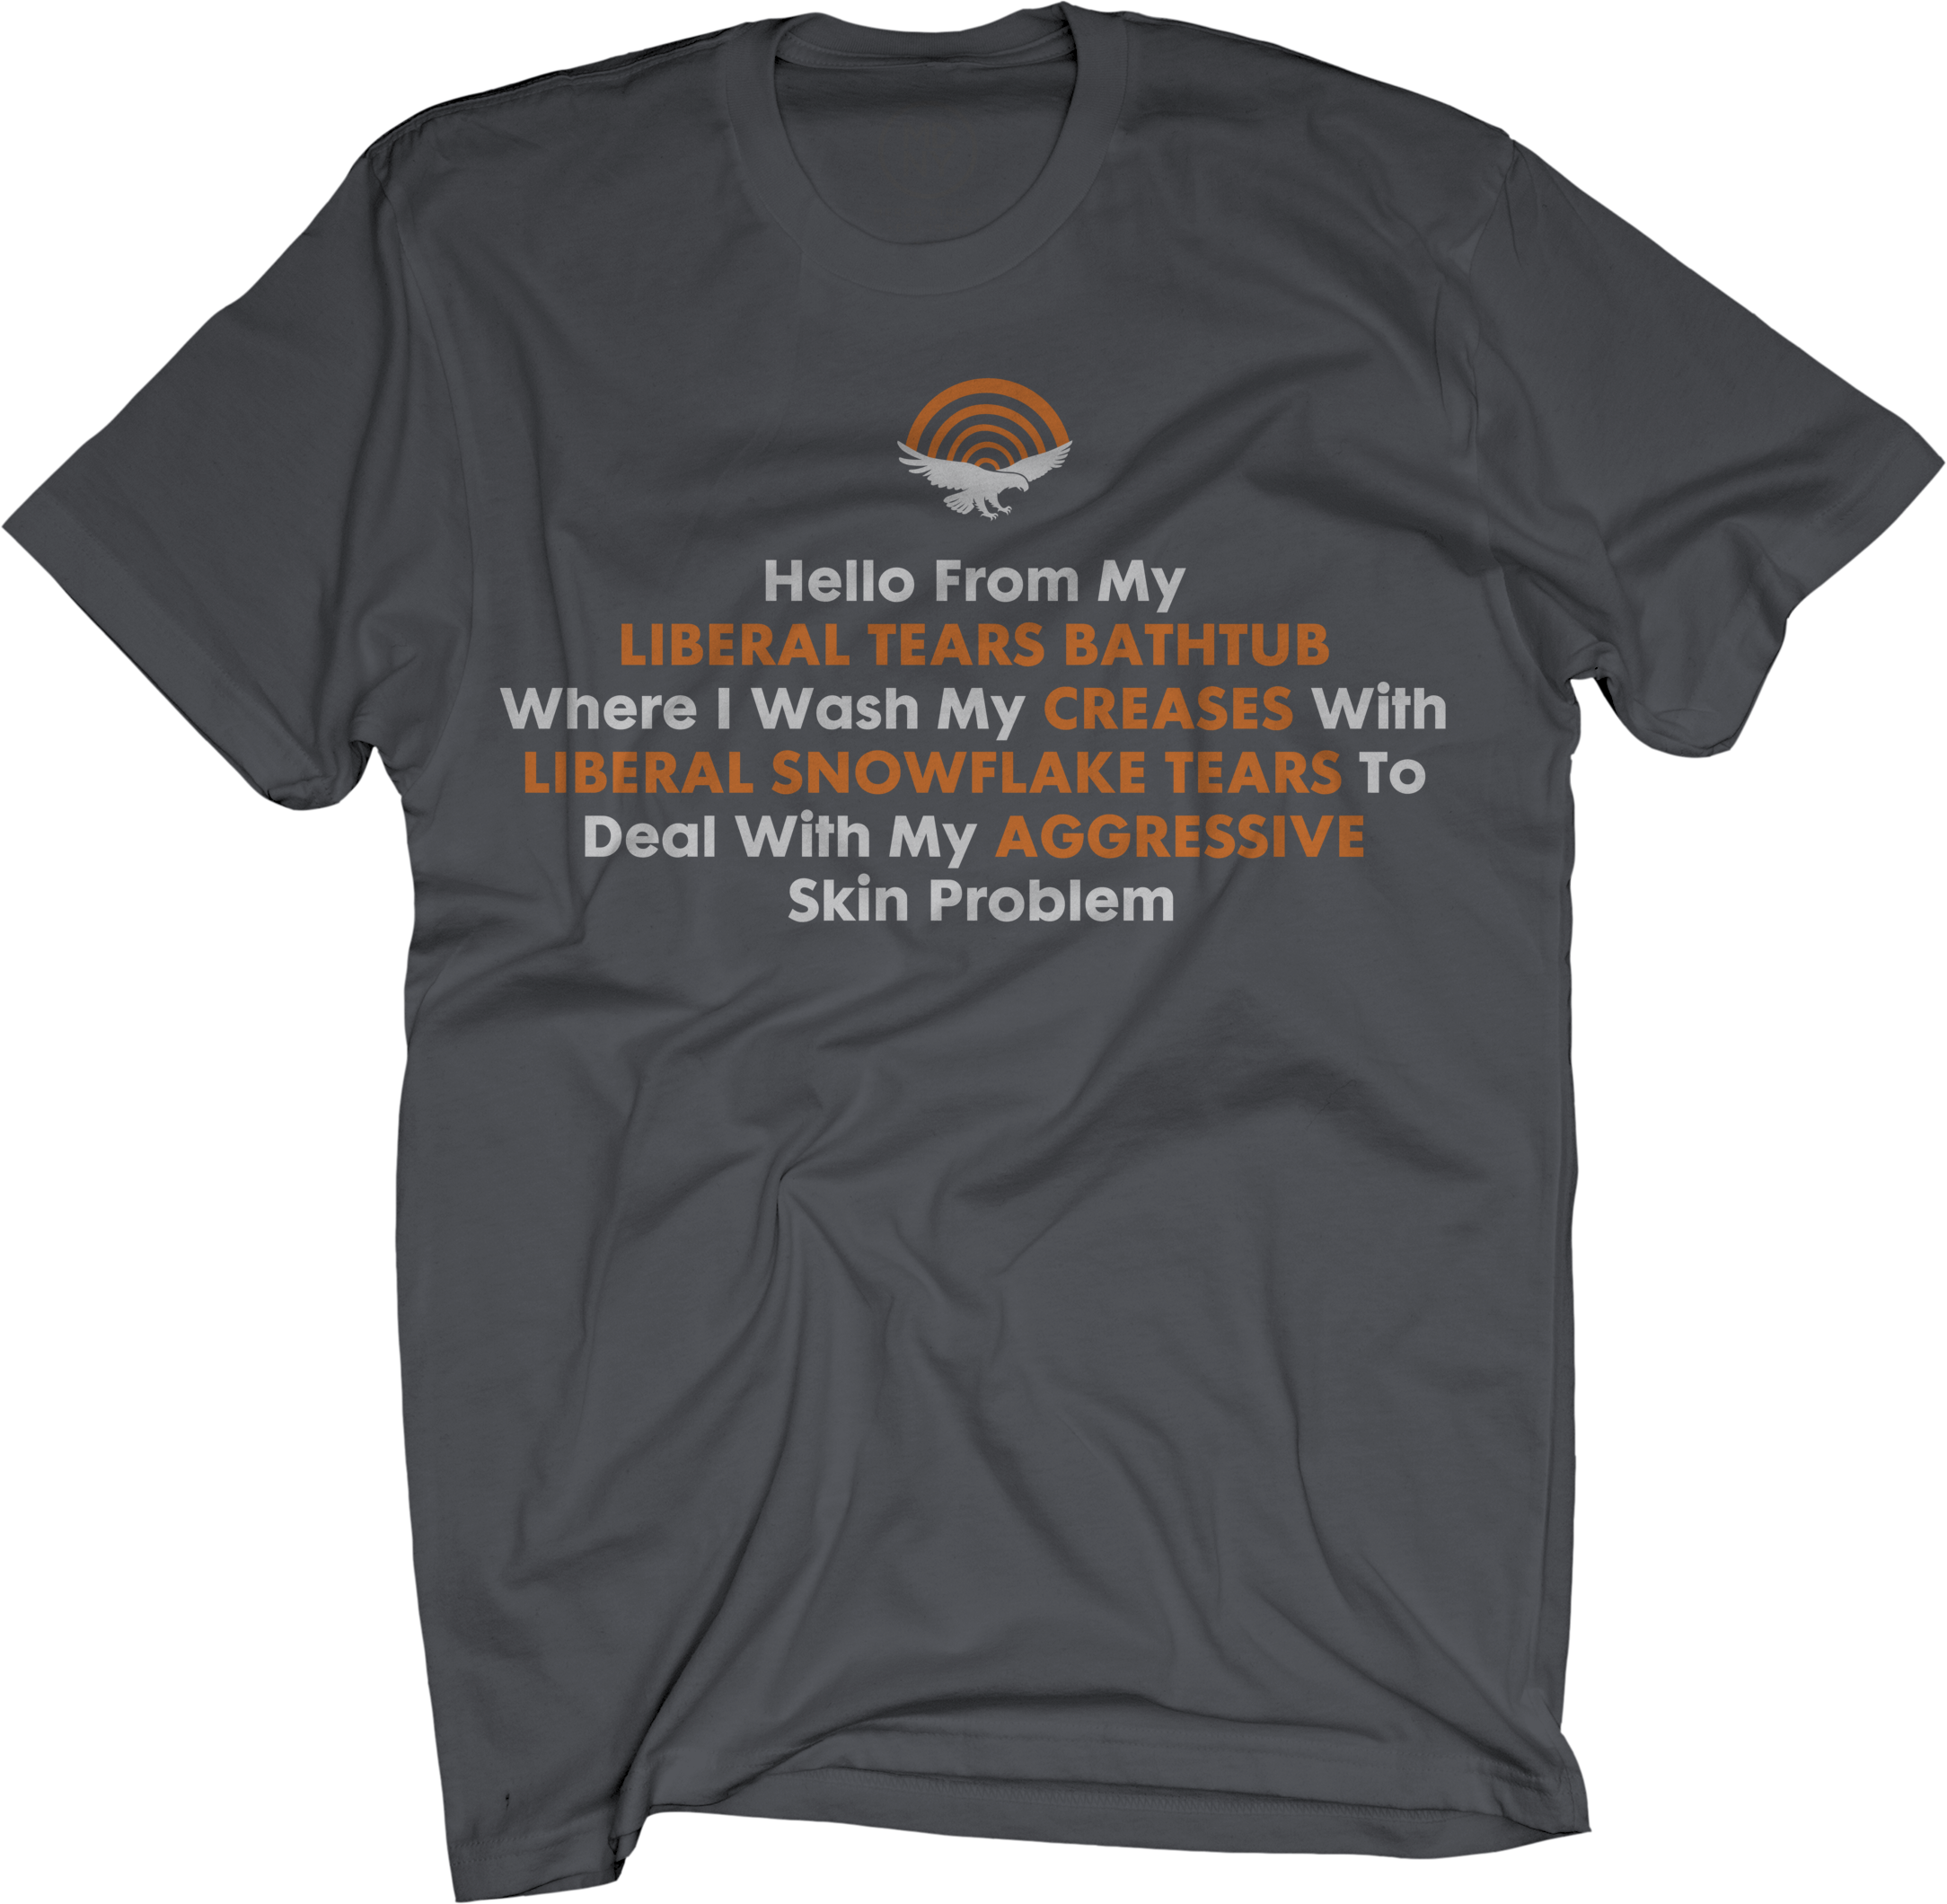 Liberal Tears on Charcoal T-Shirt